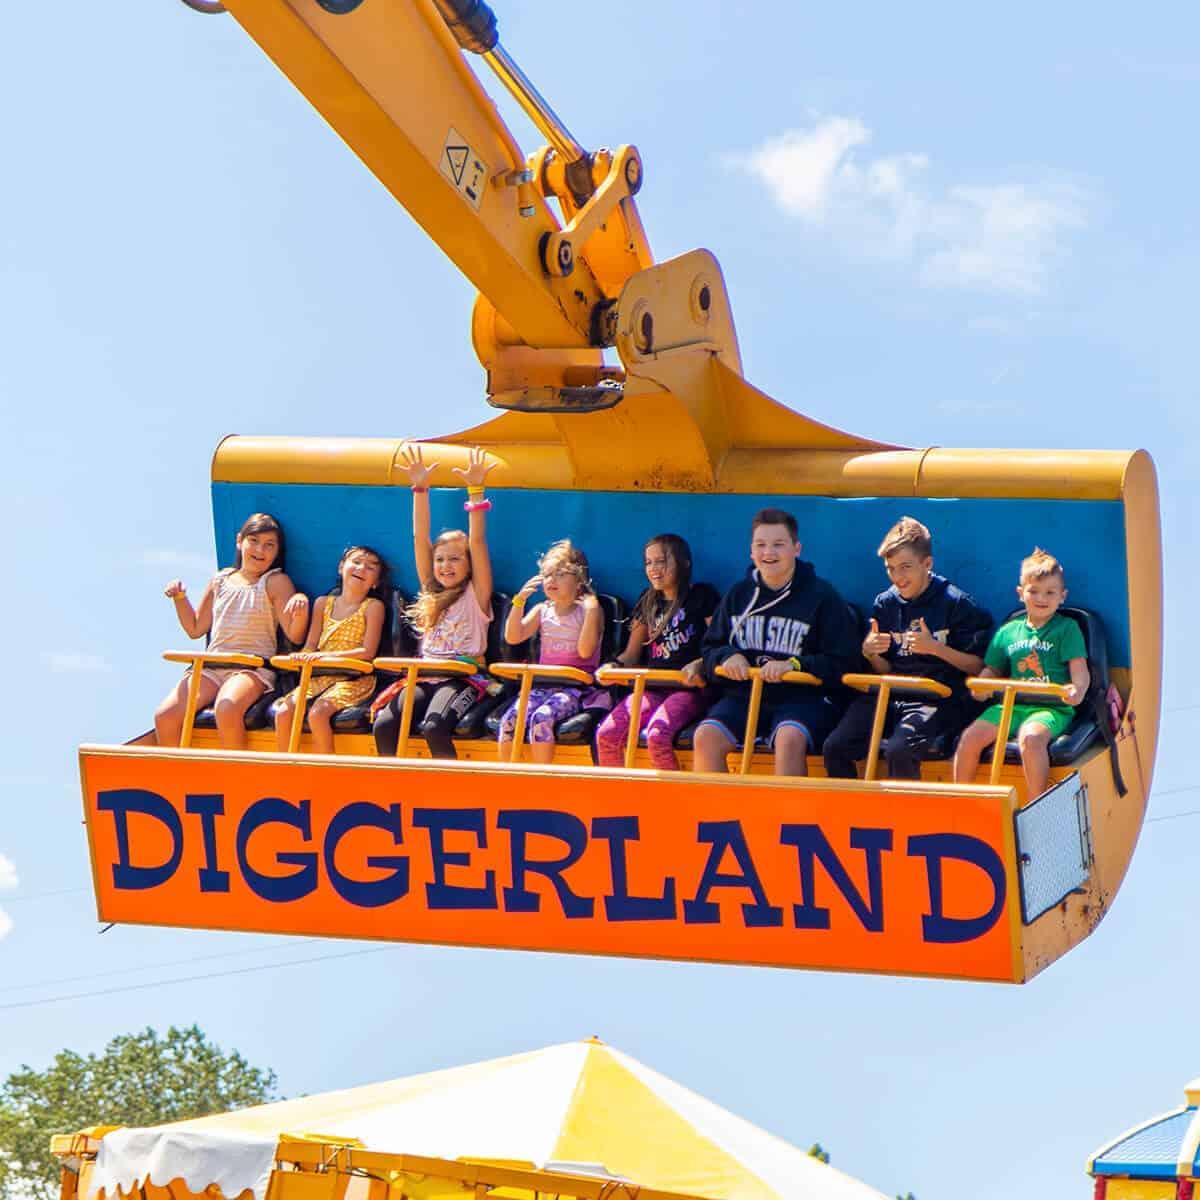 Spin dizzy ride with many happy children enjoying it